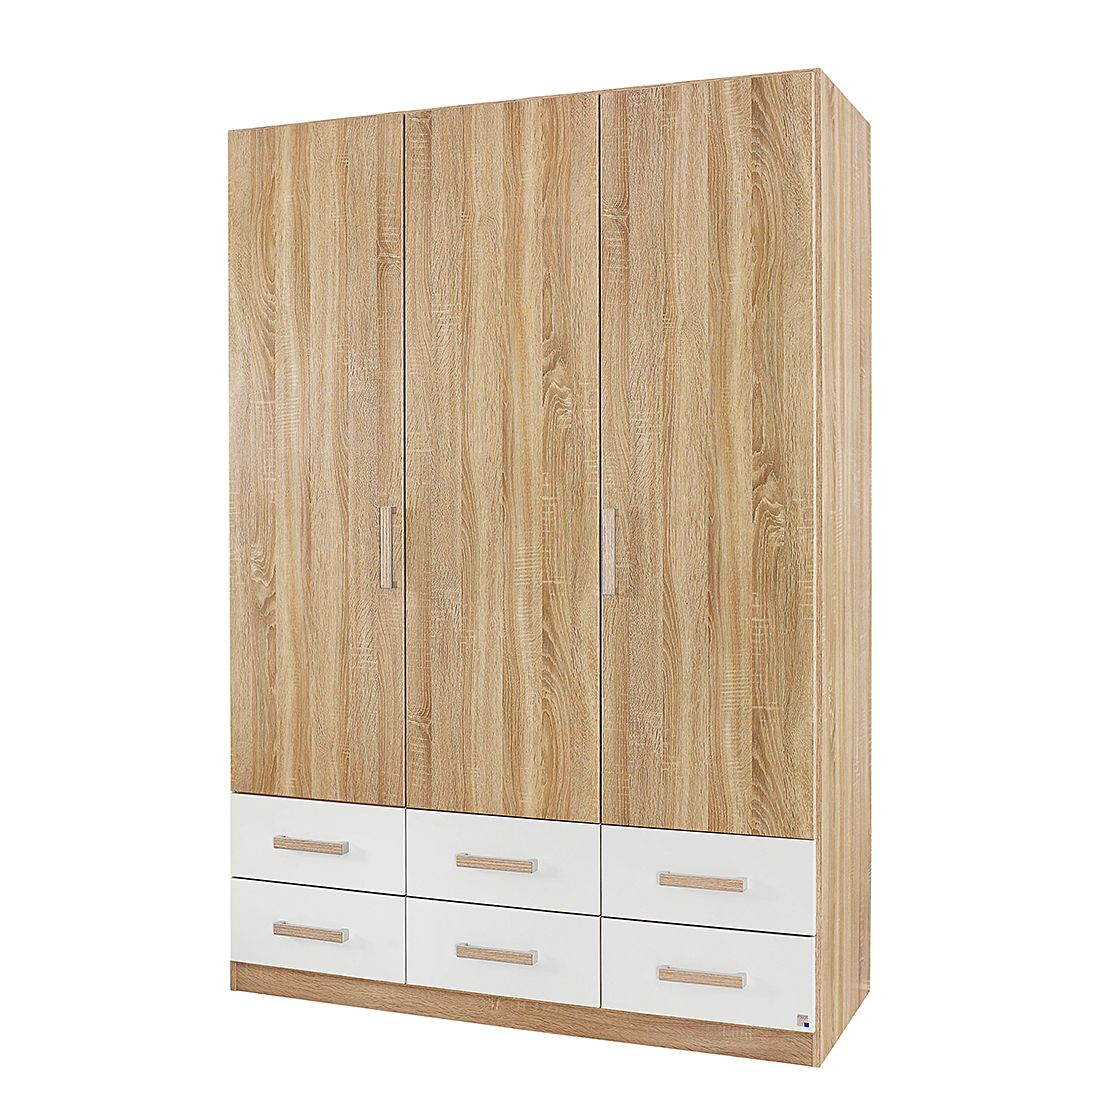 Armoire à portes battantes Samira - Imitation chêne / Blanc alpin - 91 cm - 2 portes, Rauch Packs